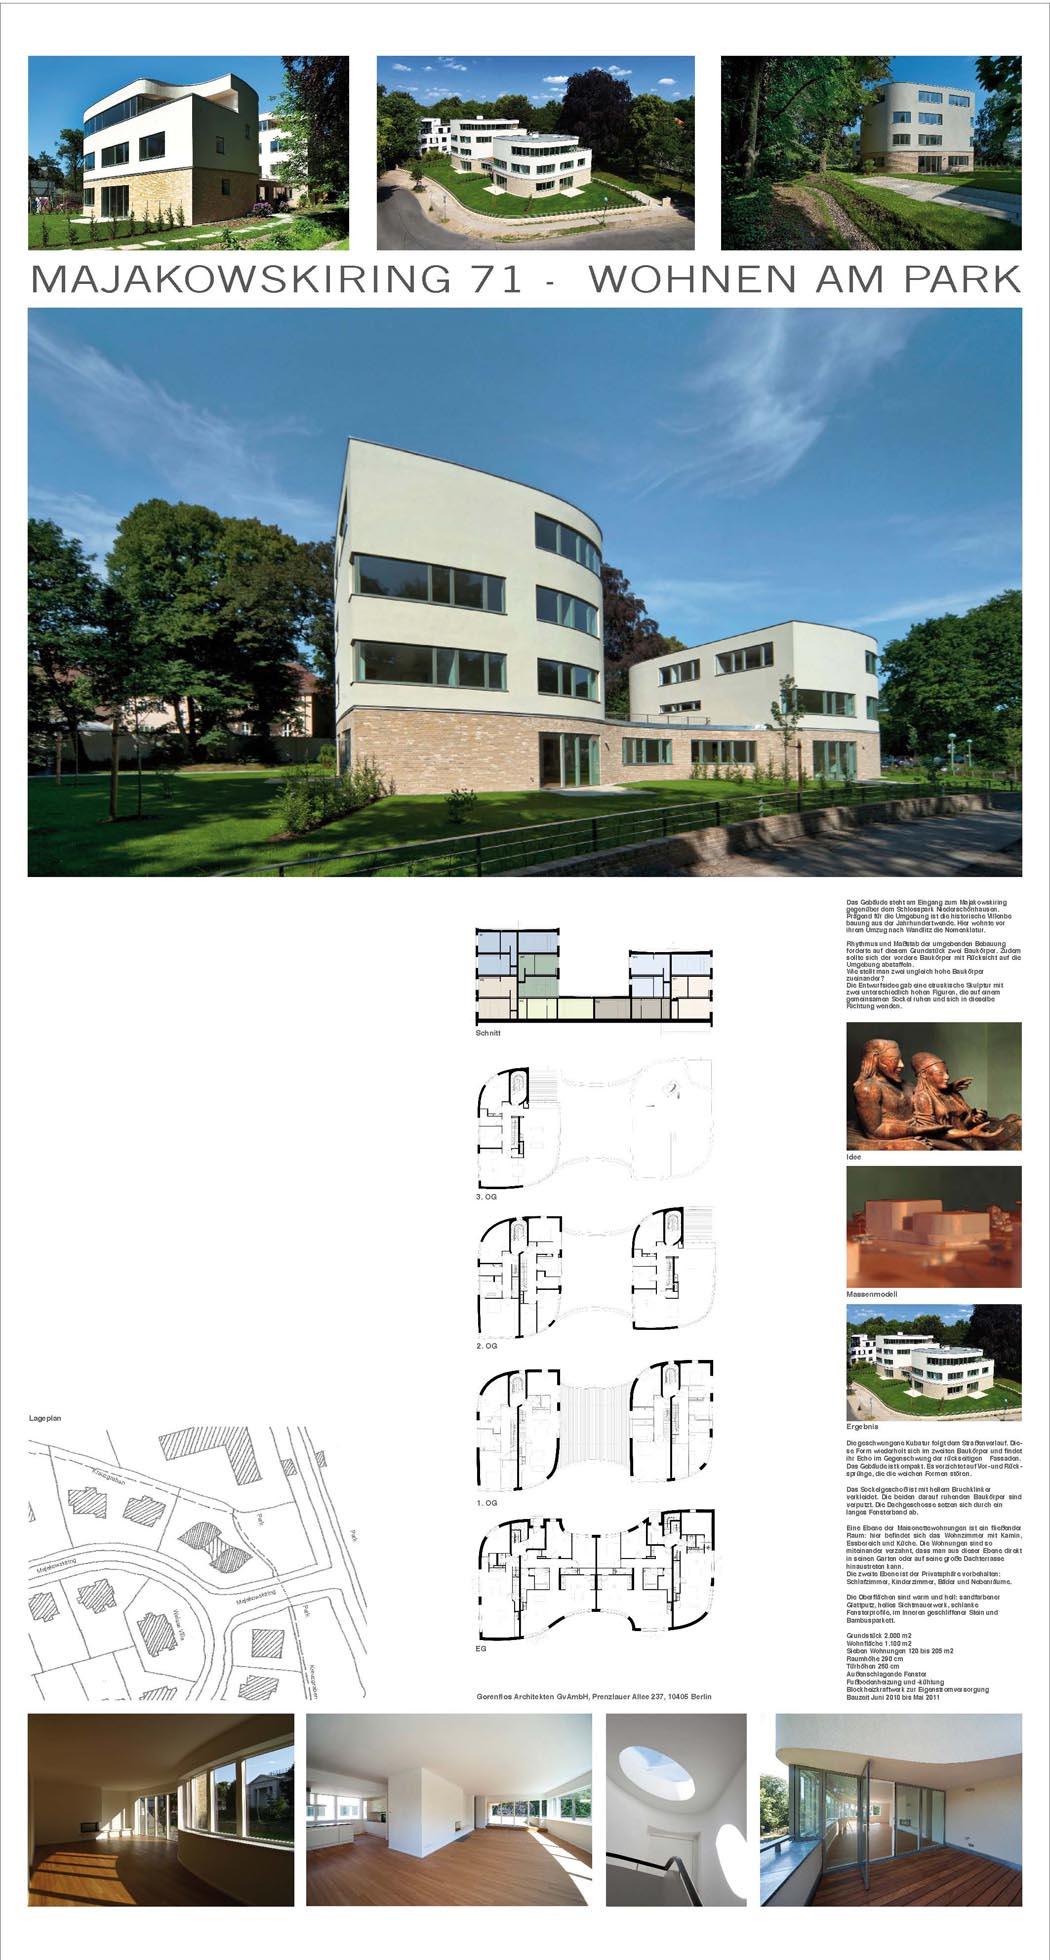 46 wohnen am park majakowskiring 71 bda berlin publikumspreis. Black Bedroom Furniture Sets. Home Design Ideas